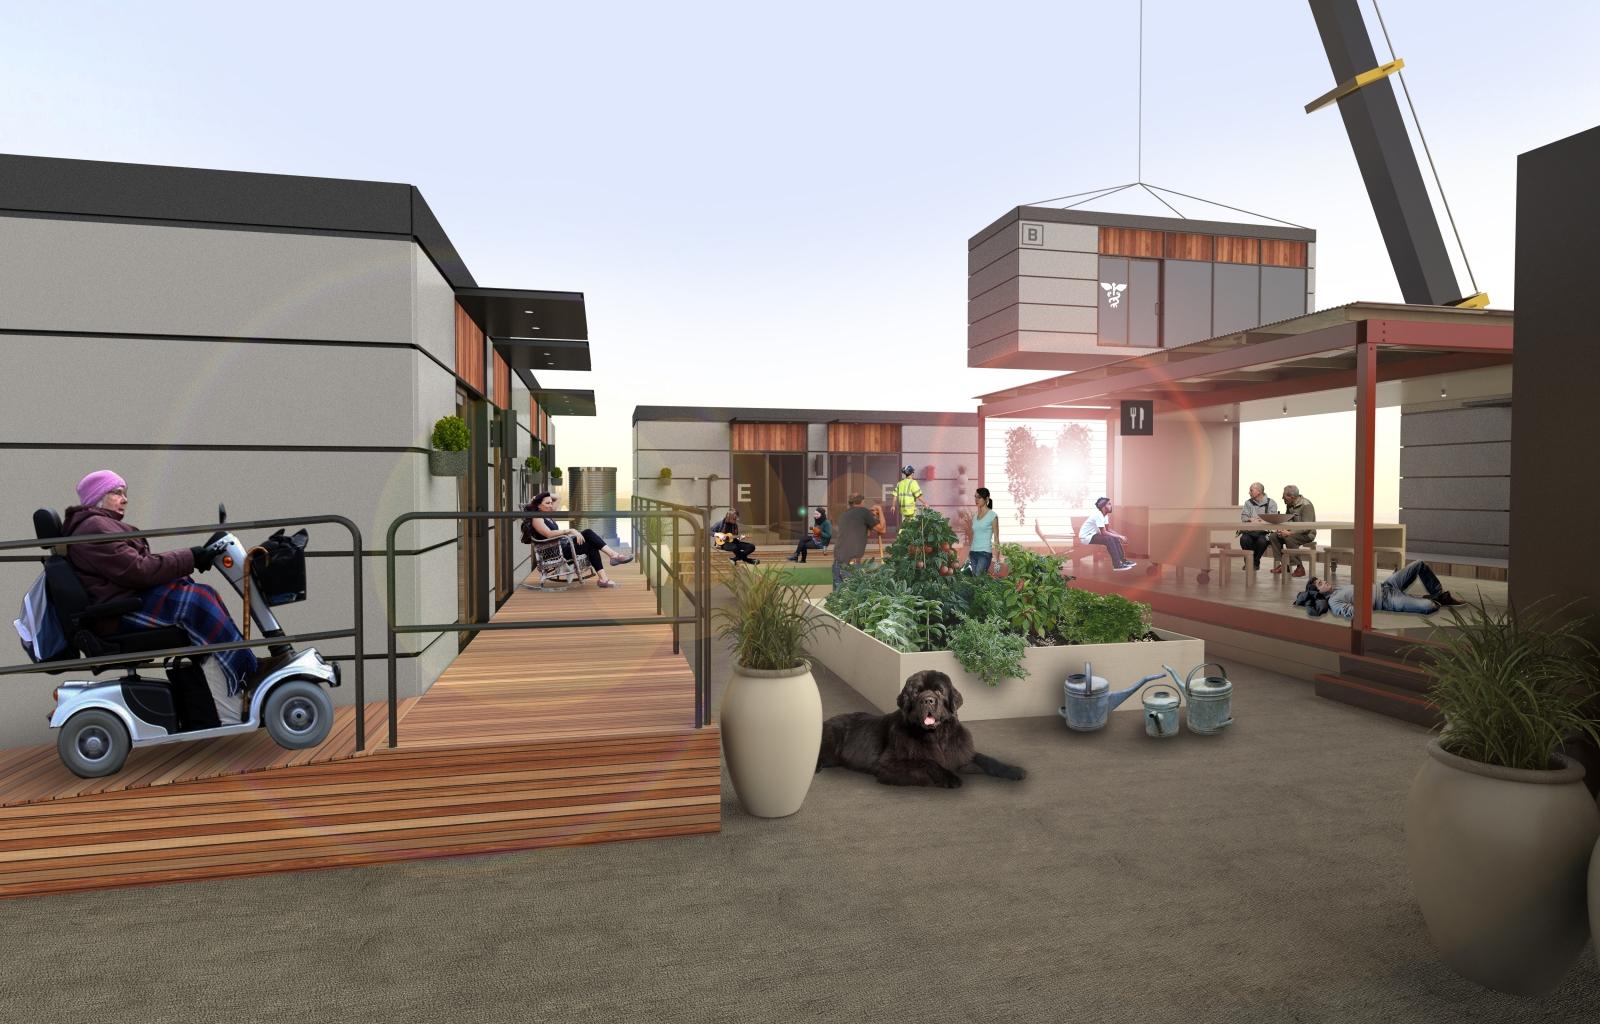 Blokable modular community home